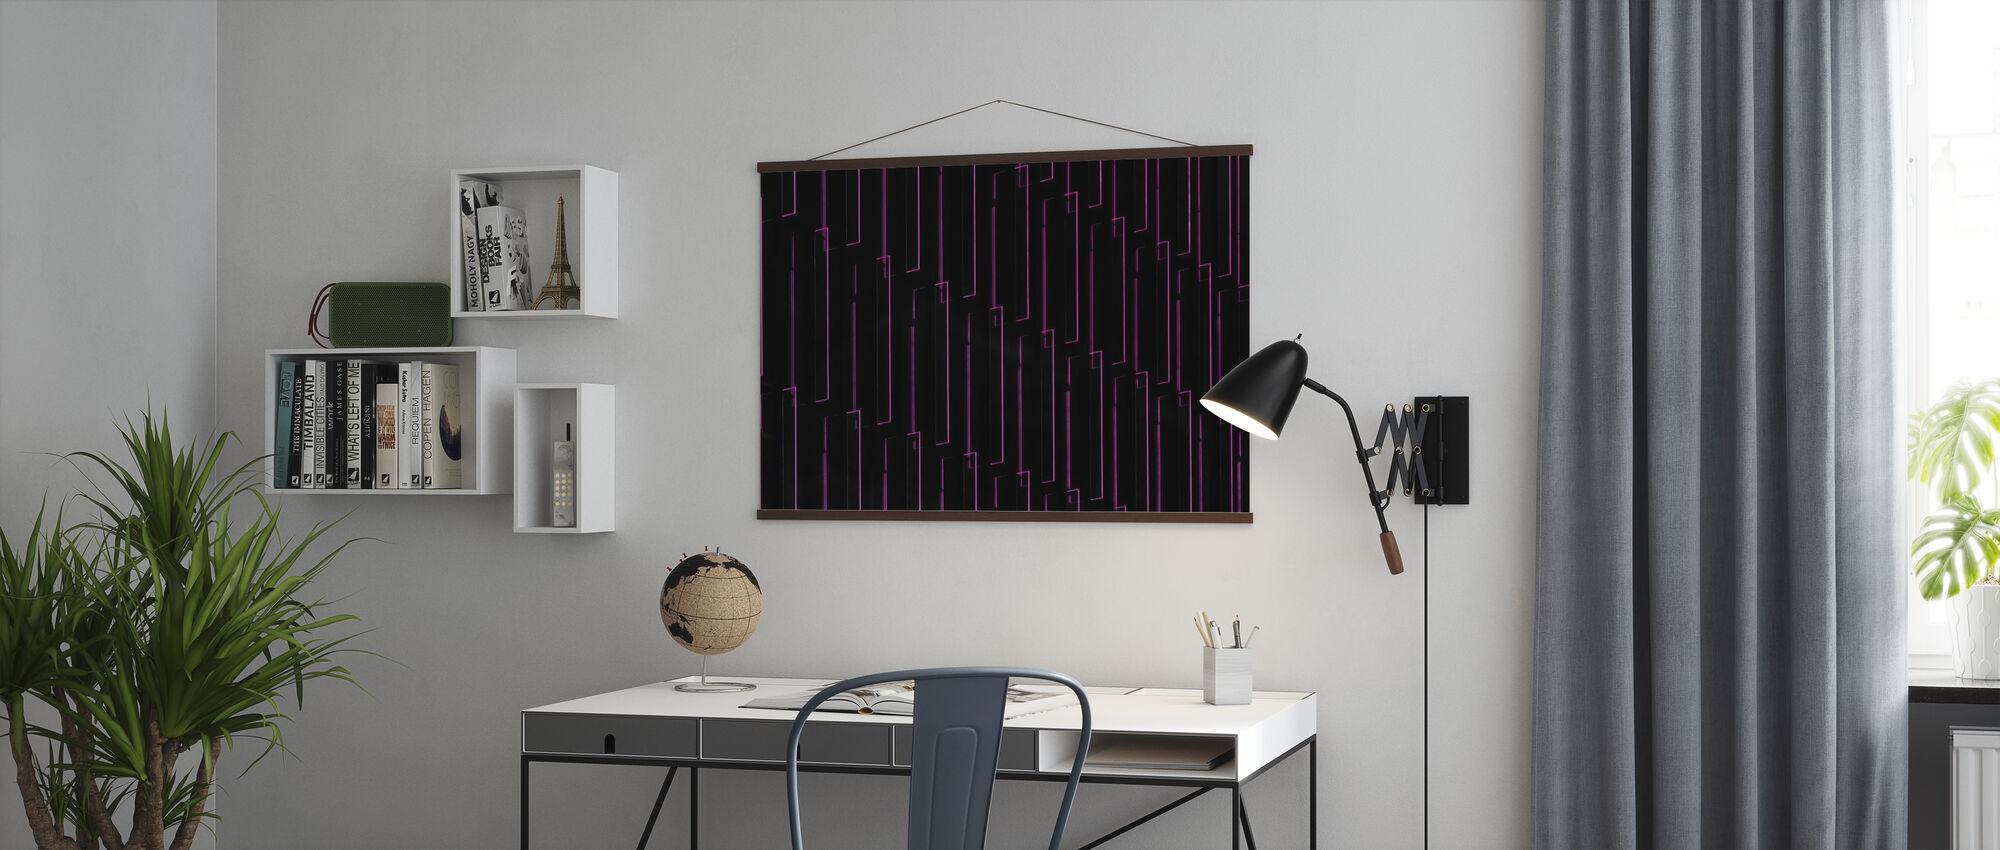 Purple Neon Lights - Poster - Office